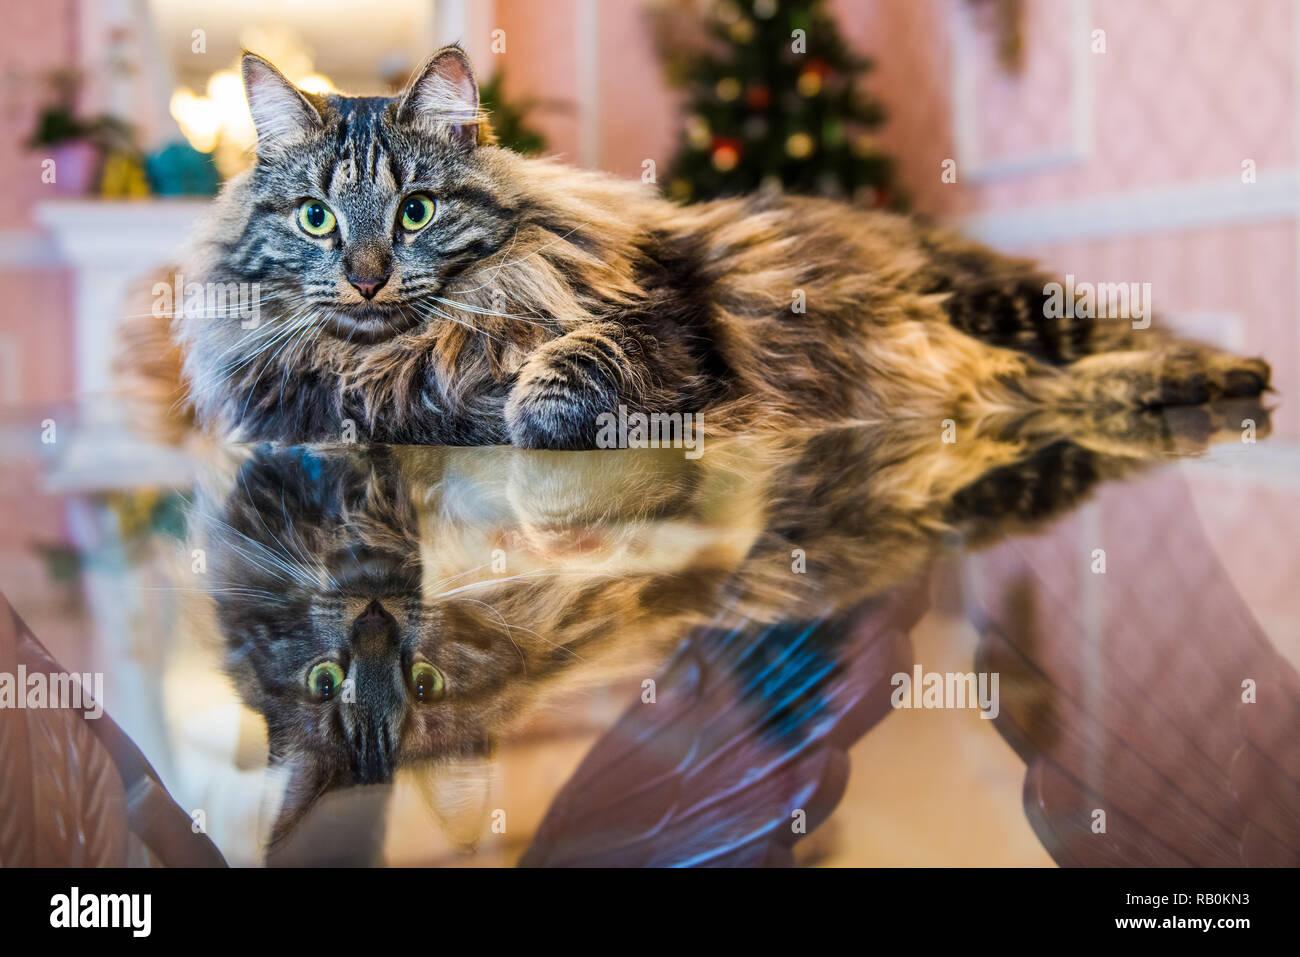 Norwegian forest fluffy cat portrait inside interior Stock Photo